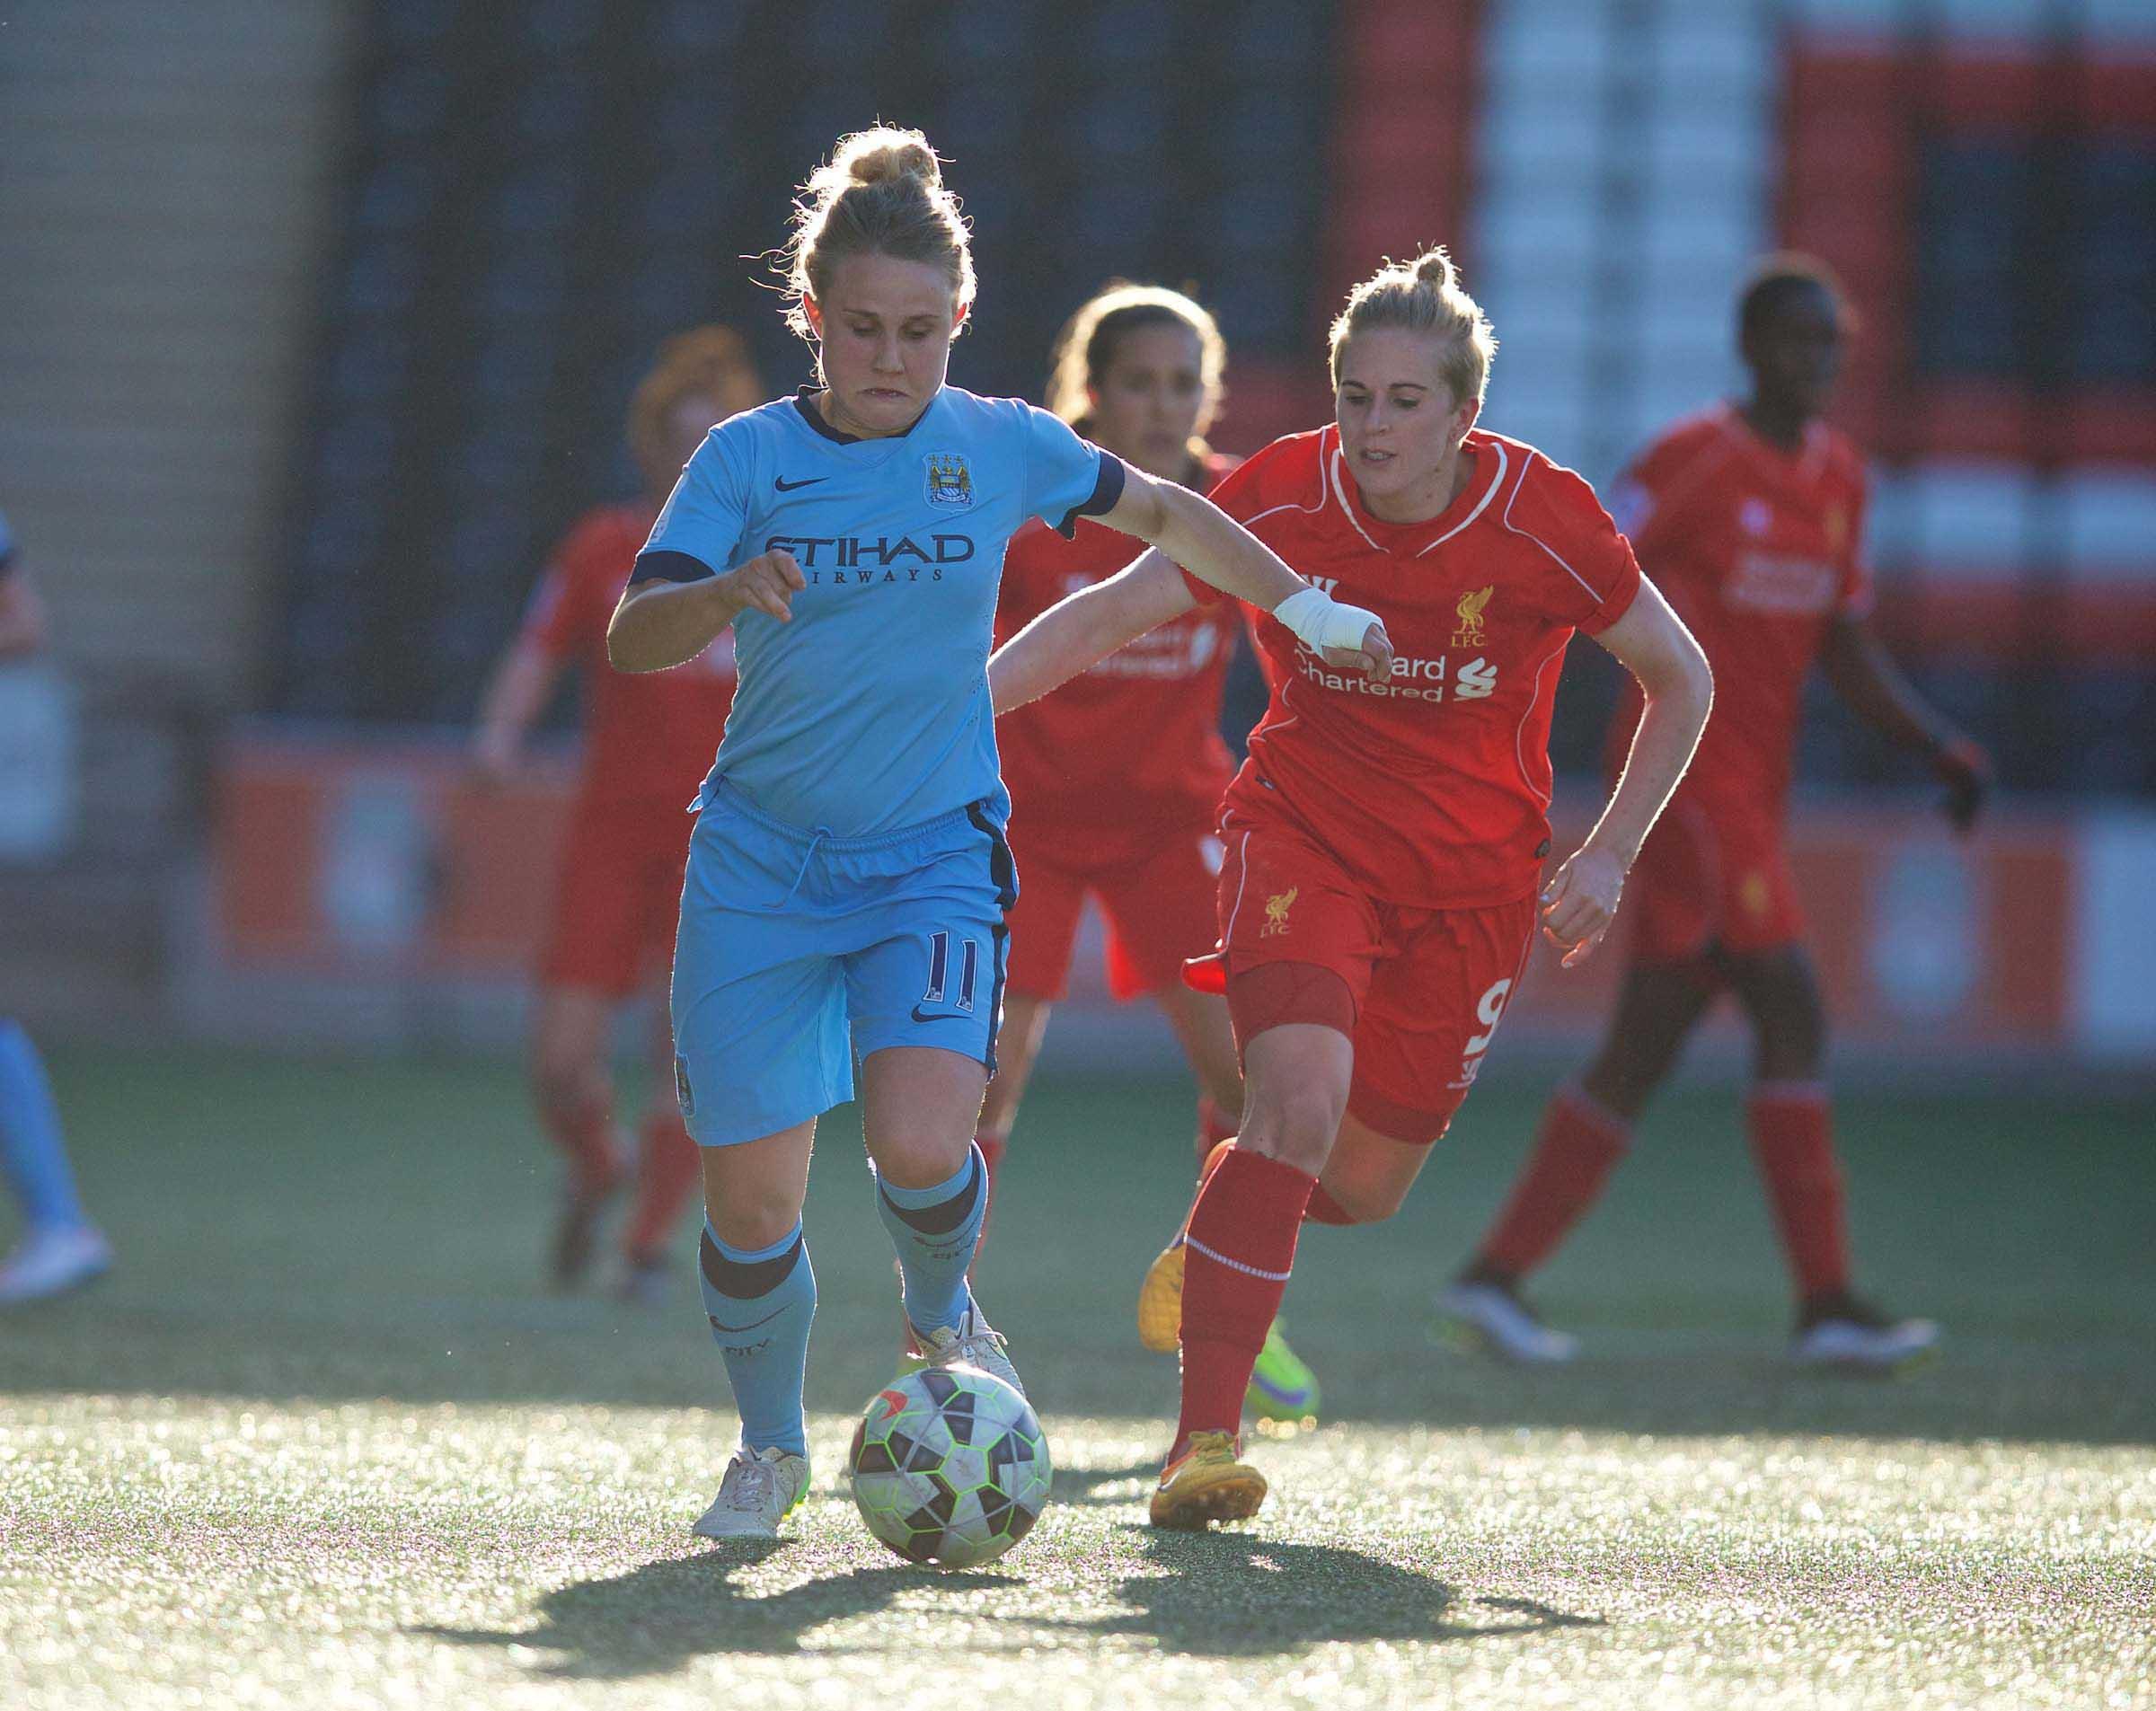 Football - FA Women's Super League - Liverpool Ladies FC v Manchester City Ladies FC